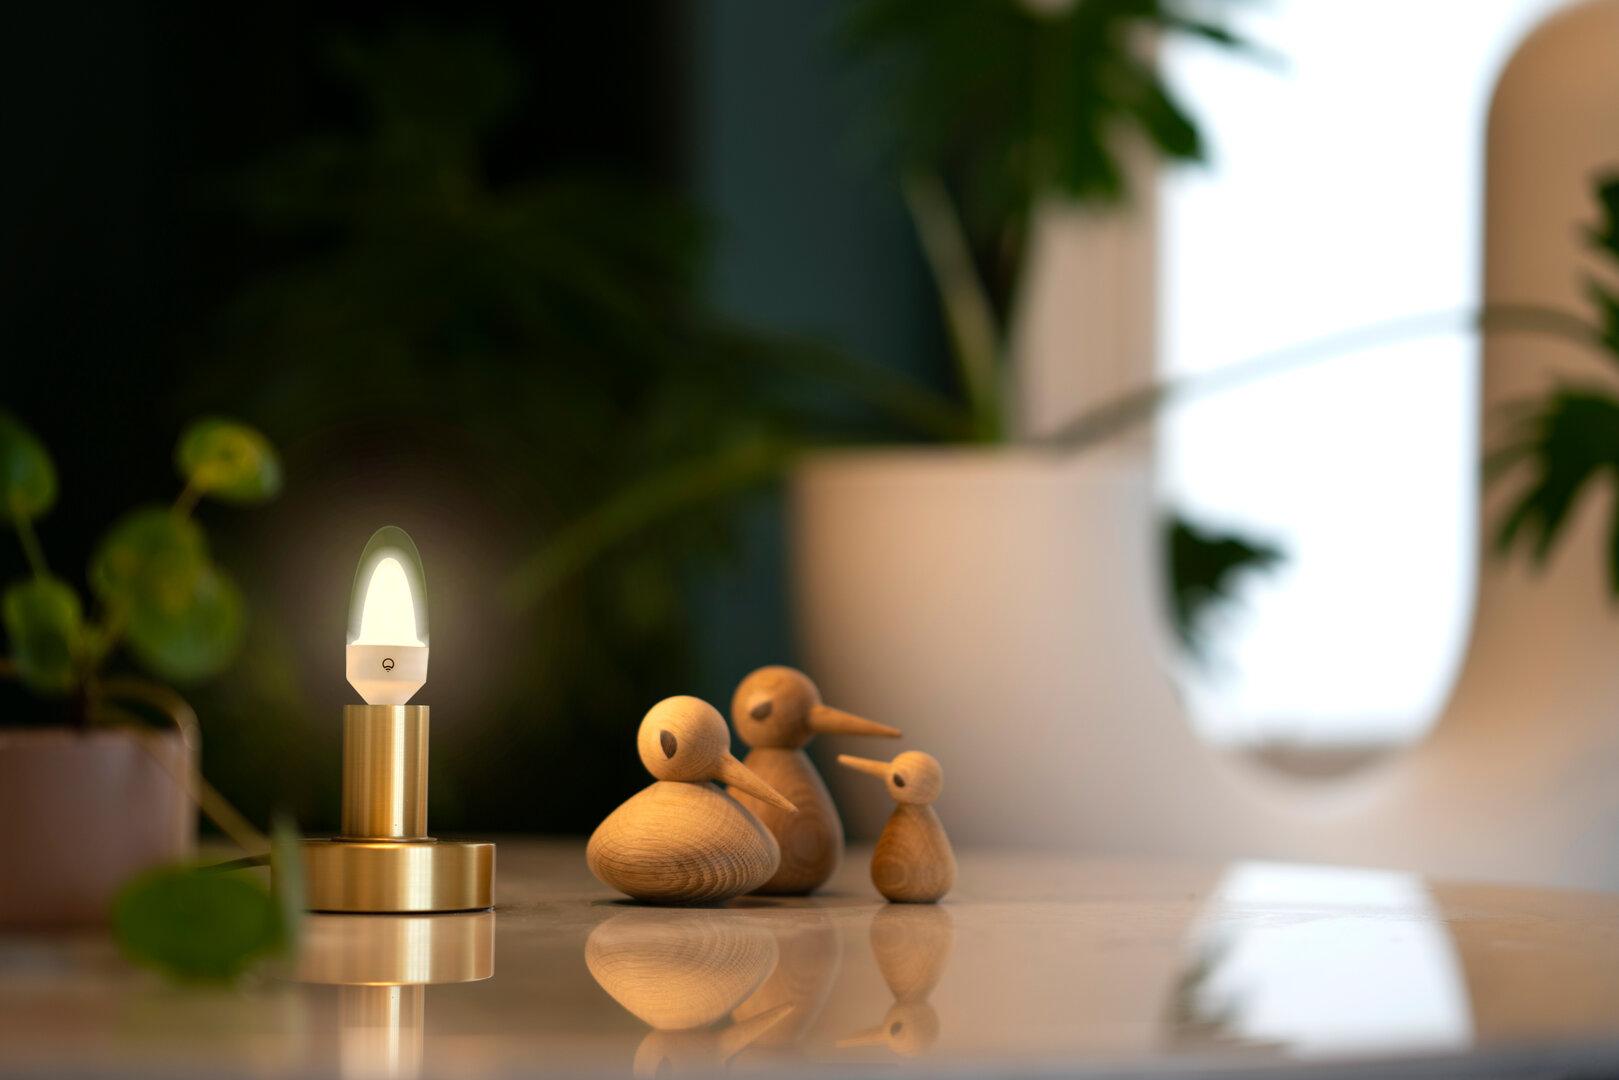 LIFX Candle White to Warm